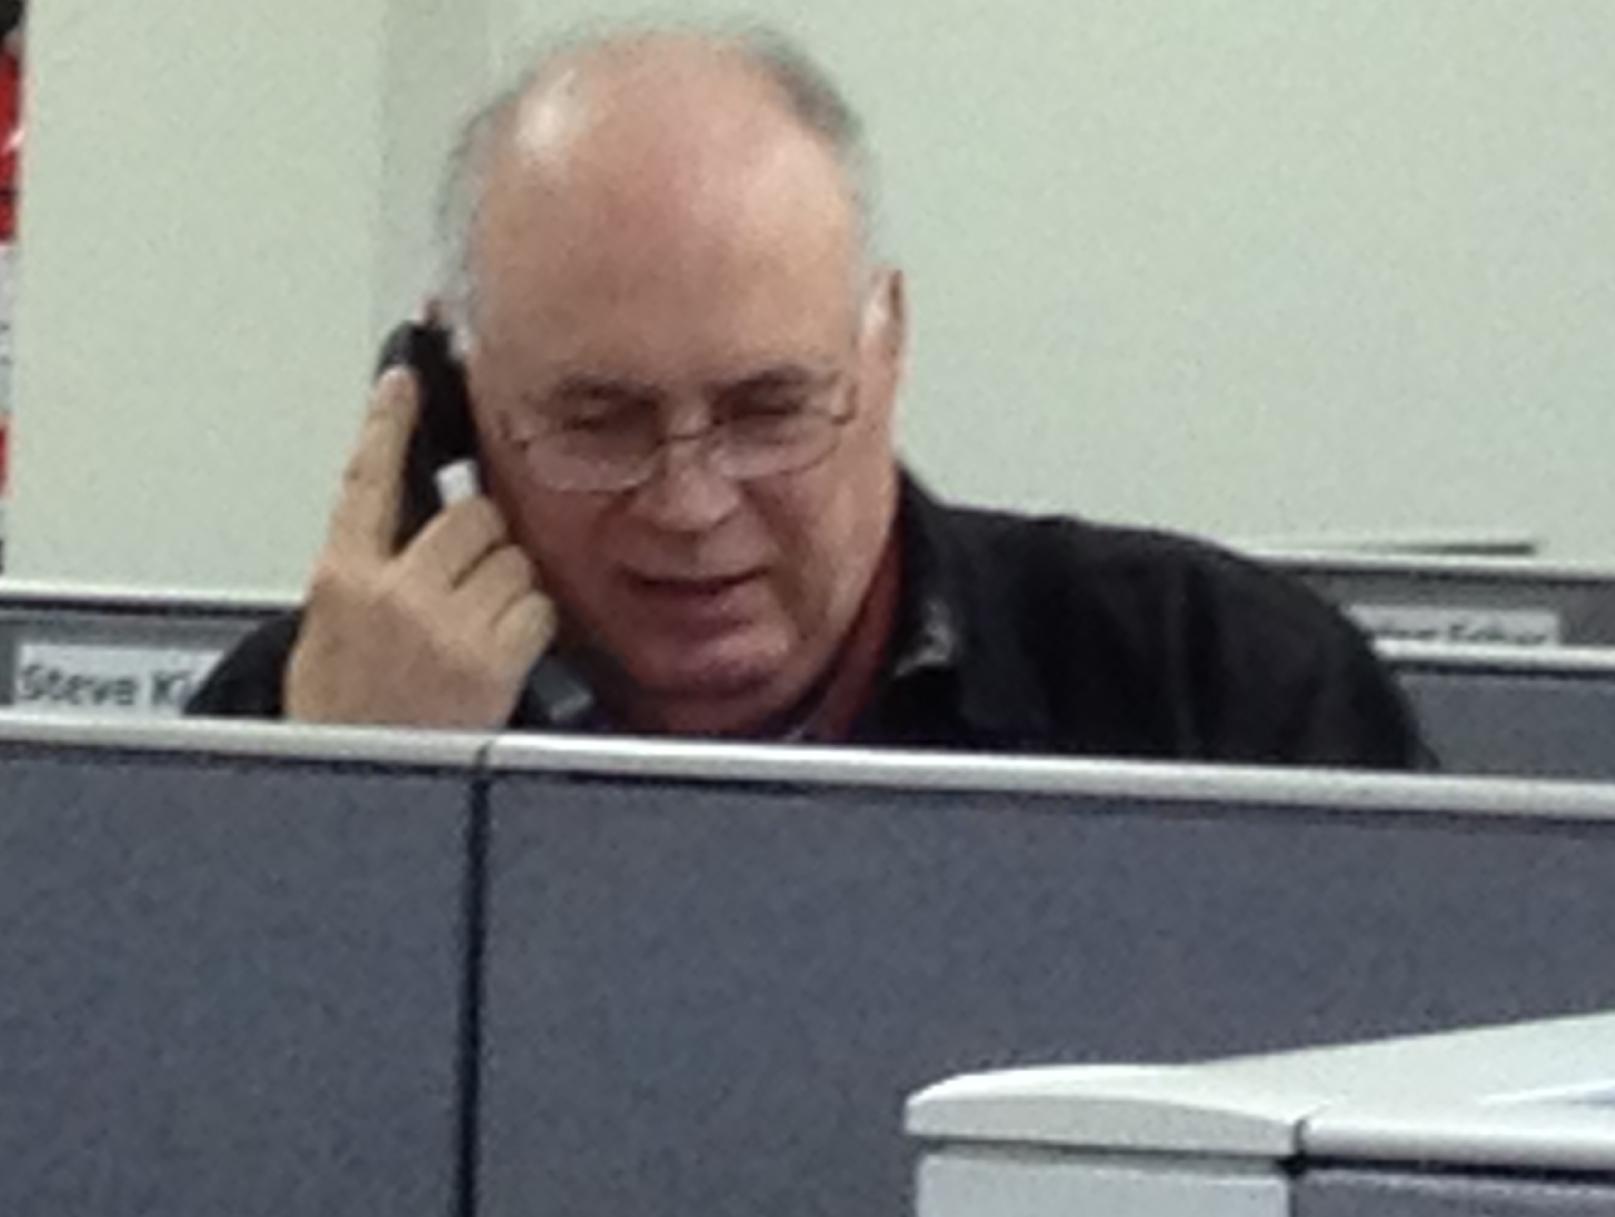 Steve on phone 1